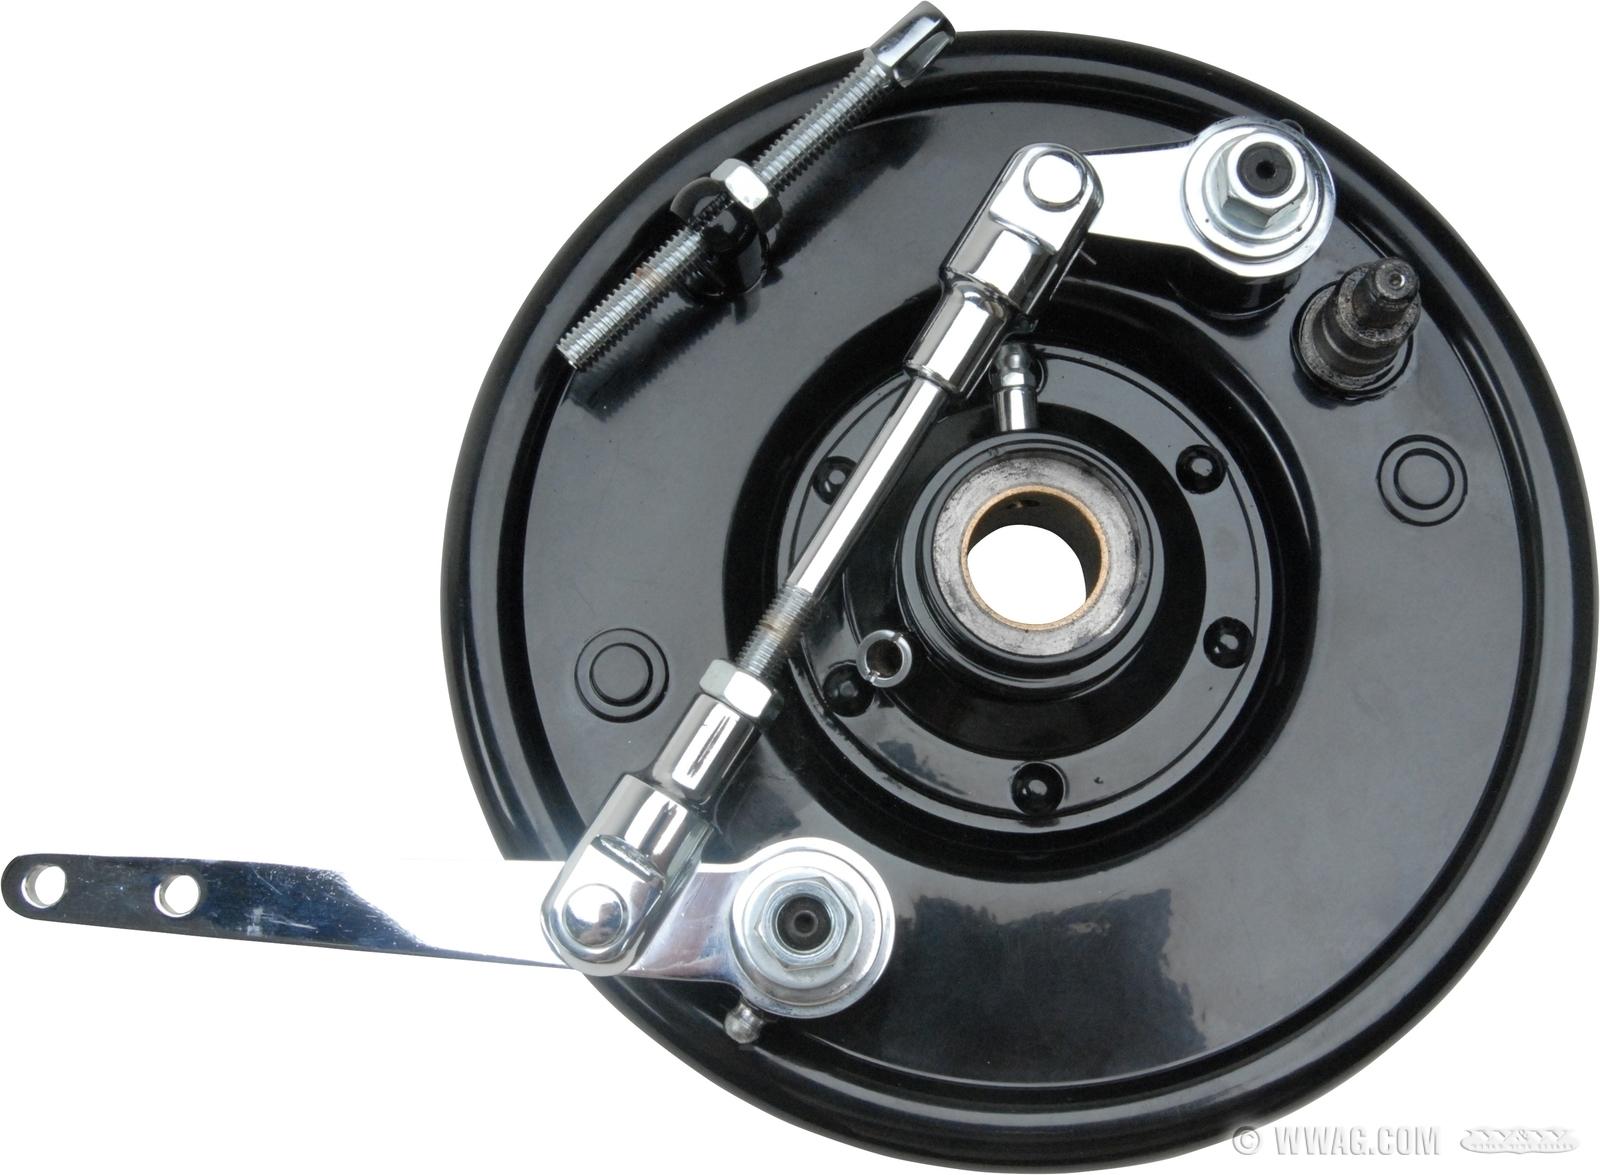 W&W Cycles - Brakes > Duplex Springer Brake